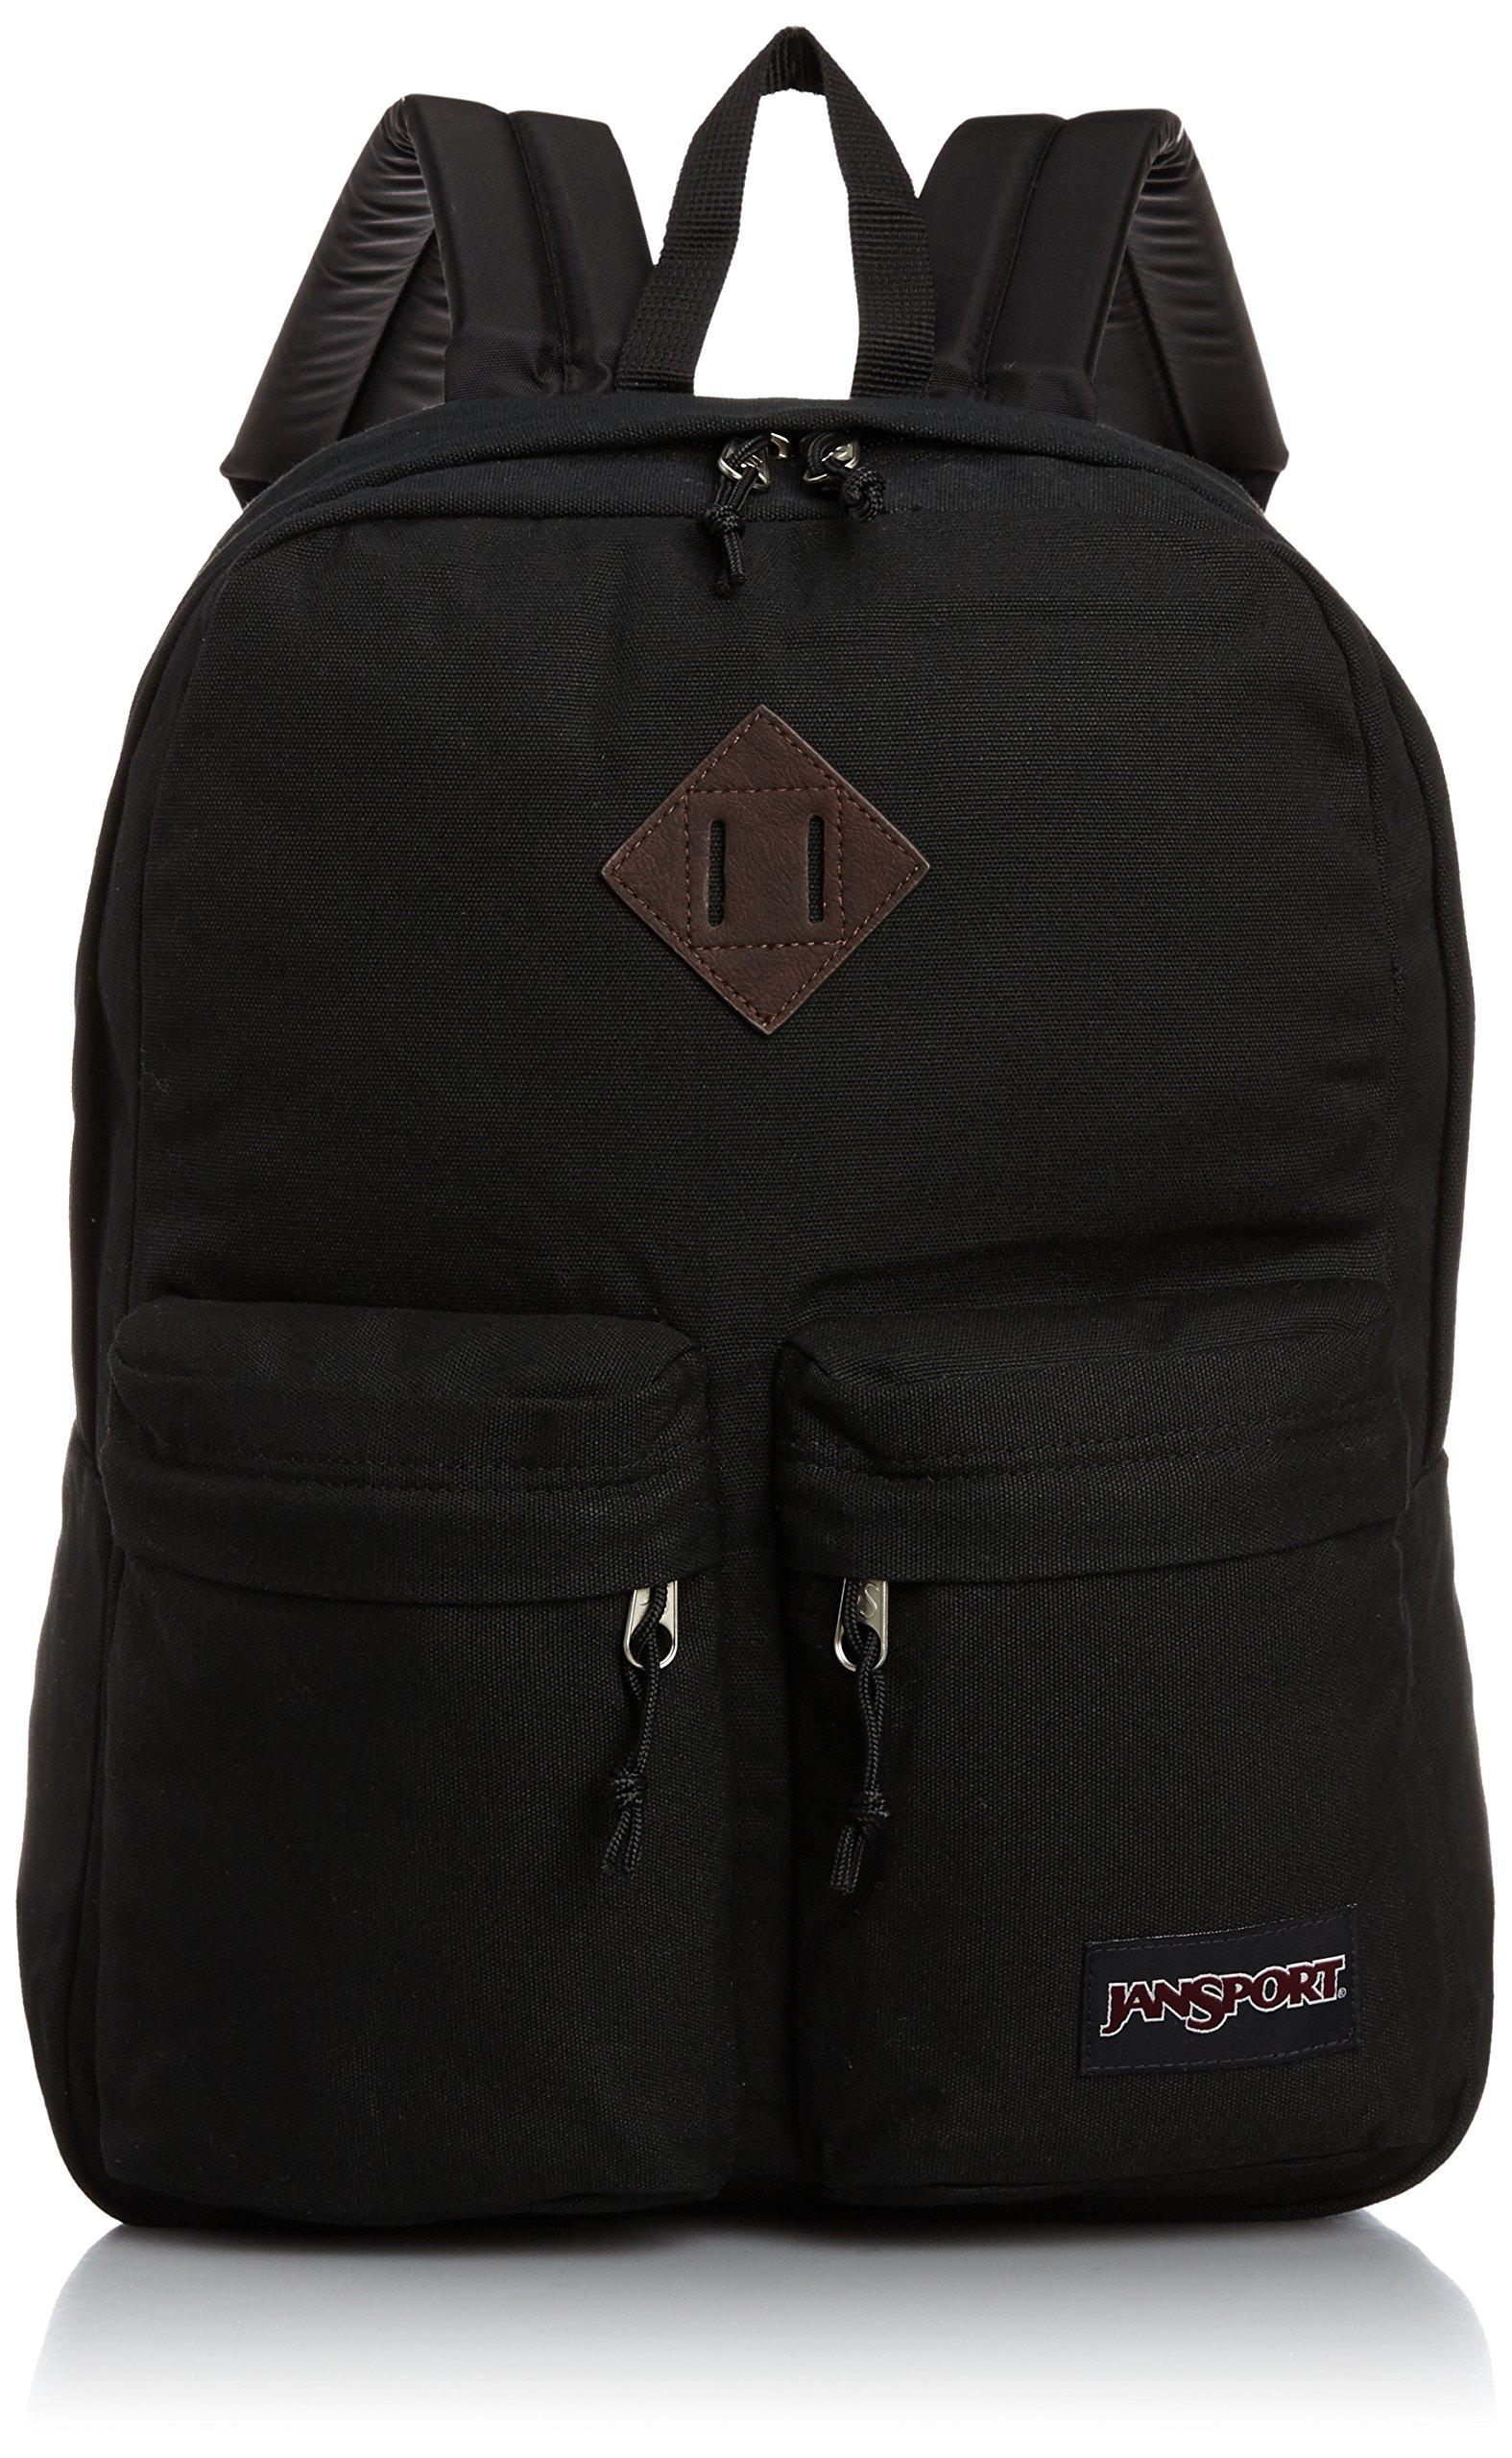 JanSport Hoffman Backpack - Black - 16.7''H x 13''W x 7''D